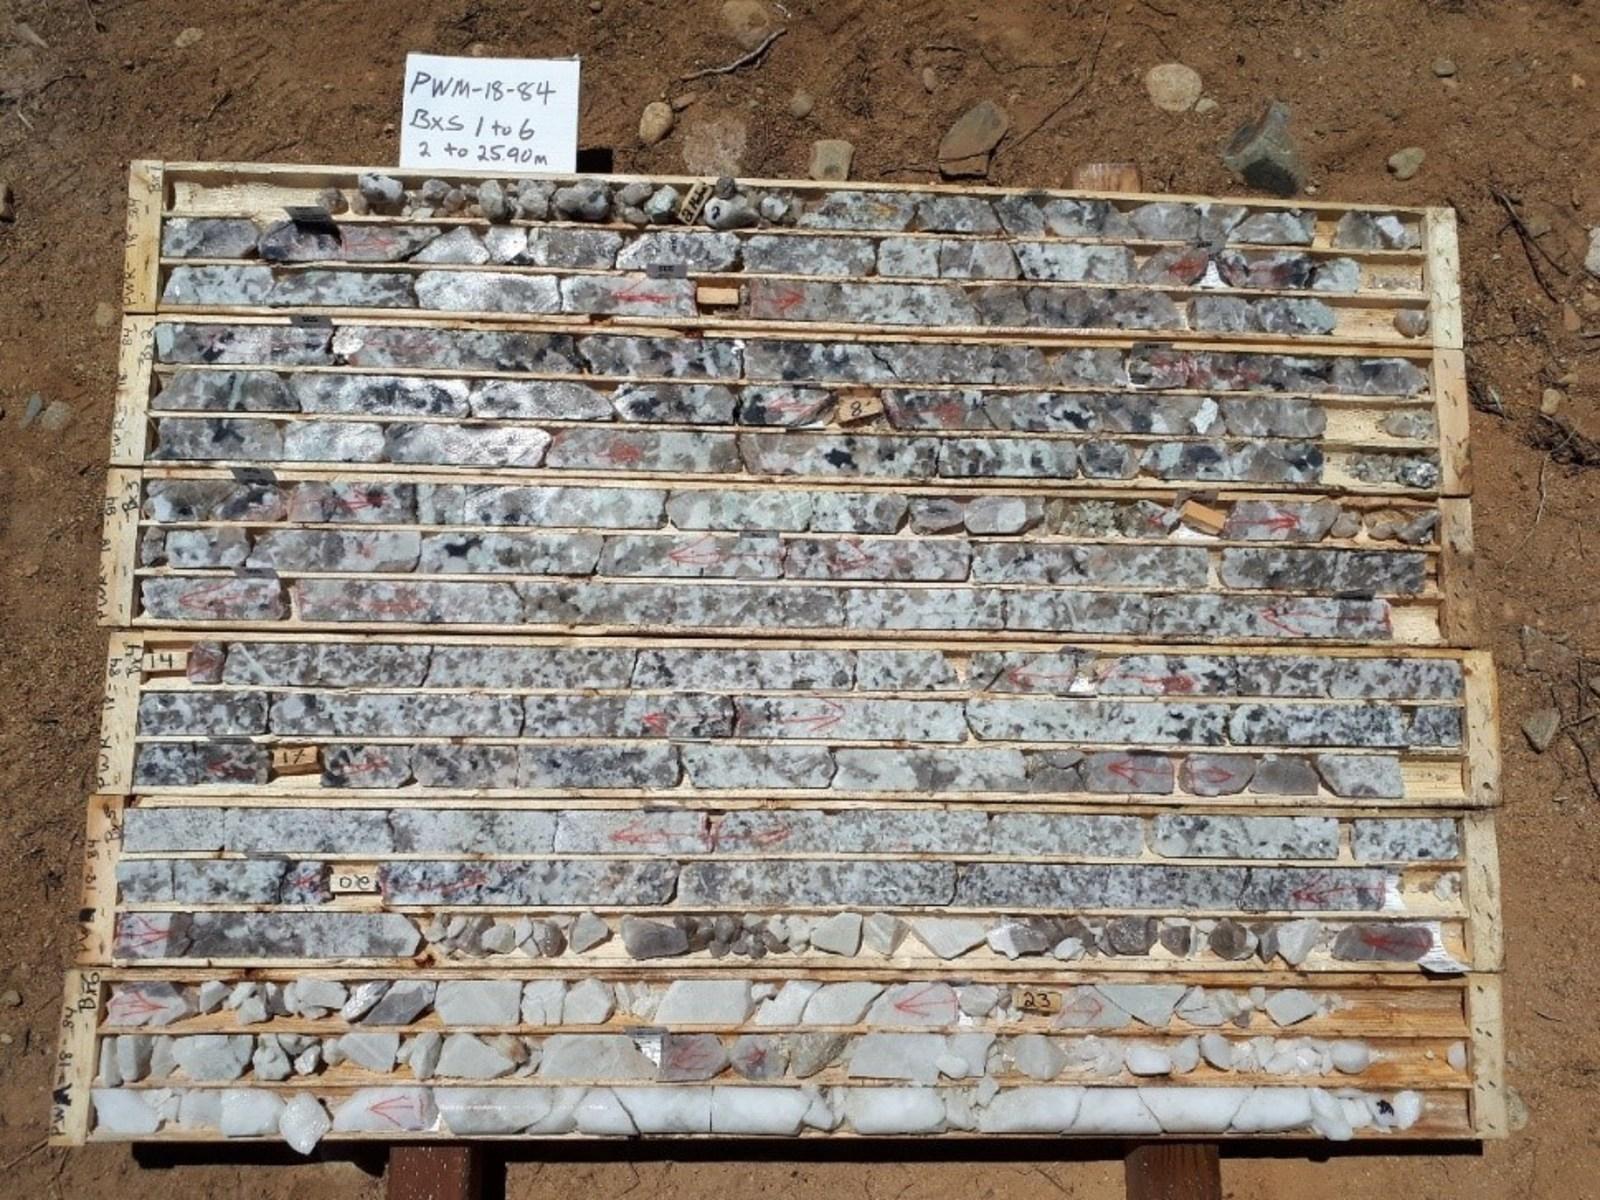 Figure 1 PWM-18-84, boxes 1 to 6, 2-25.90 m, spodumene pegmatite with 1.42 % Li2O over 19.17 m and quartz core, Main Dyke, Case Lake.